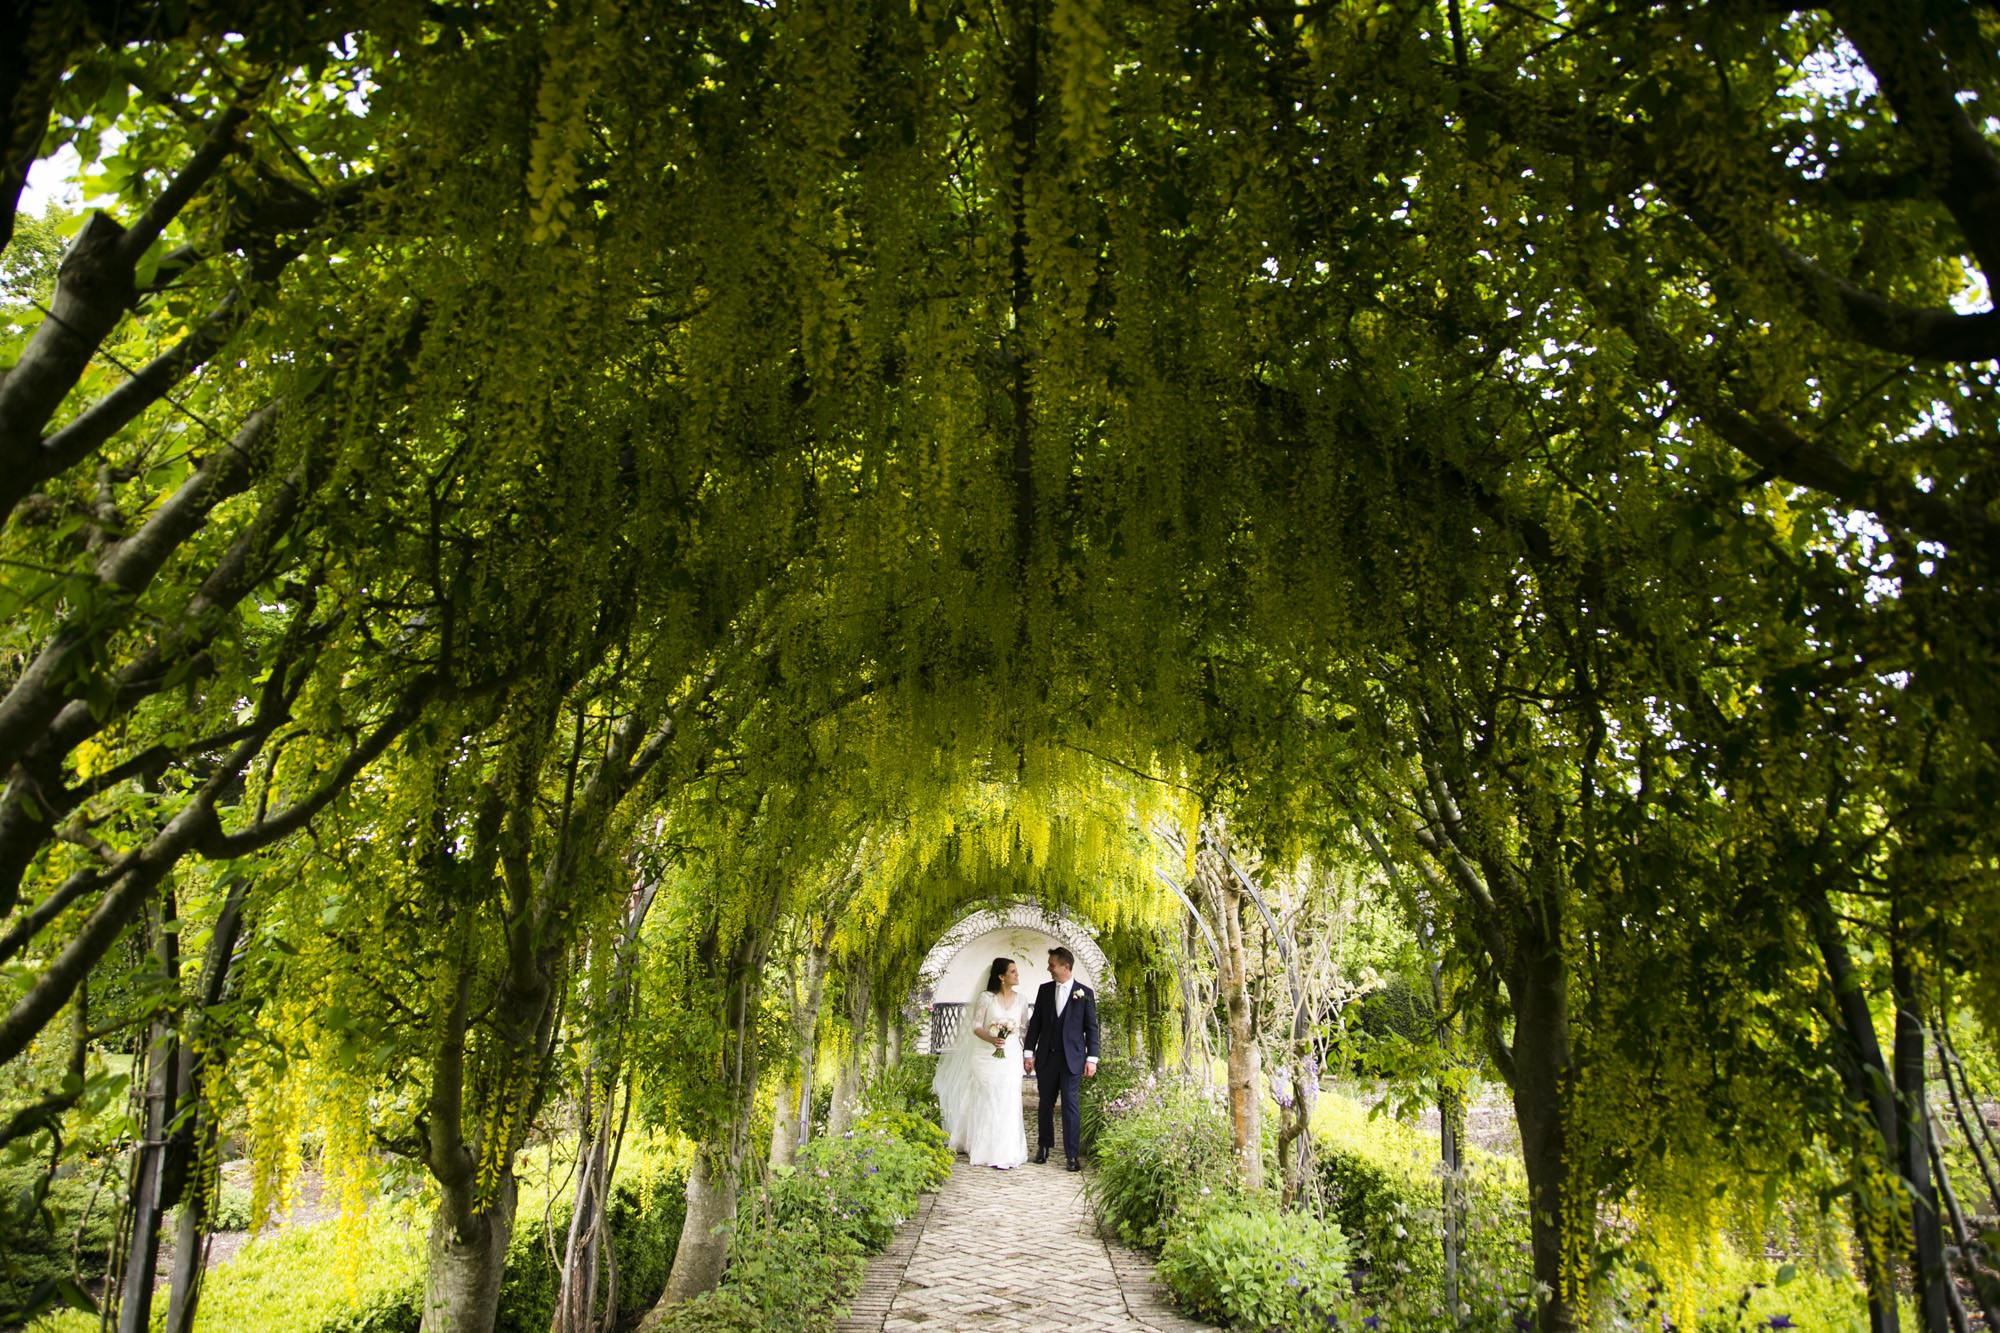 cambridge-wedding-photographer-io-1680-387.jpg